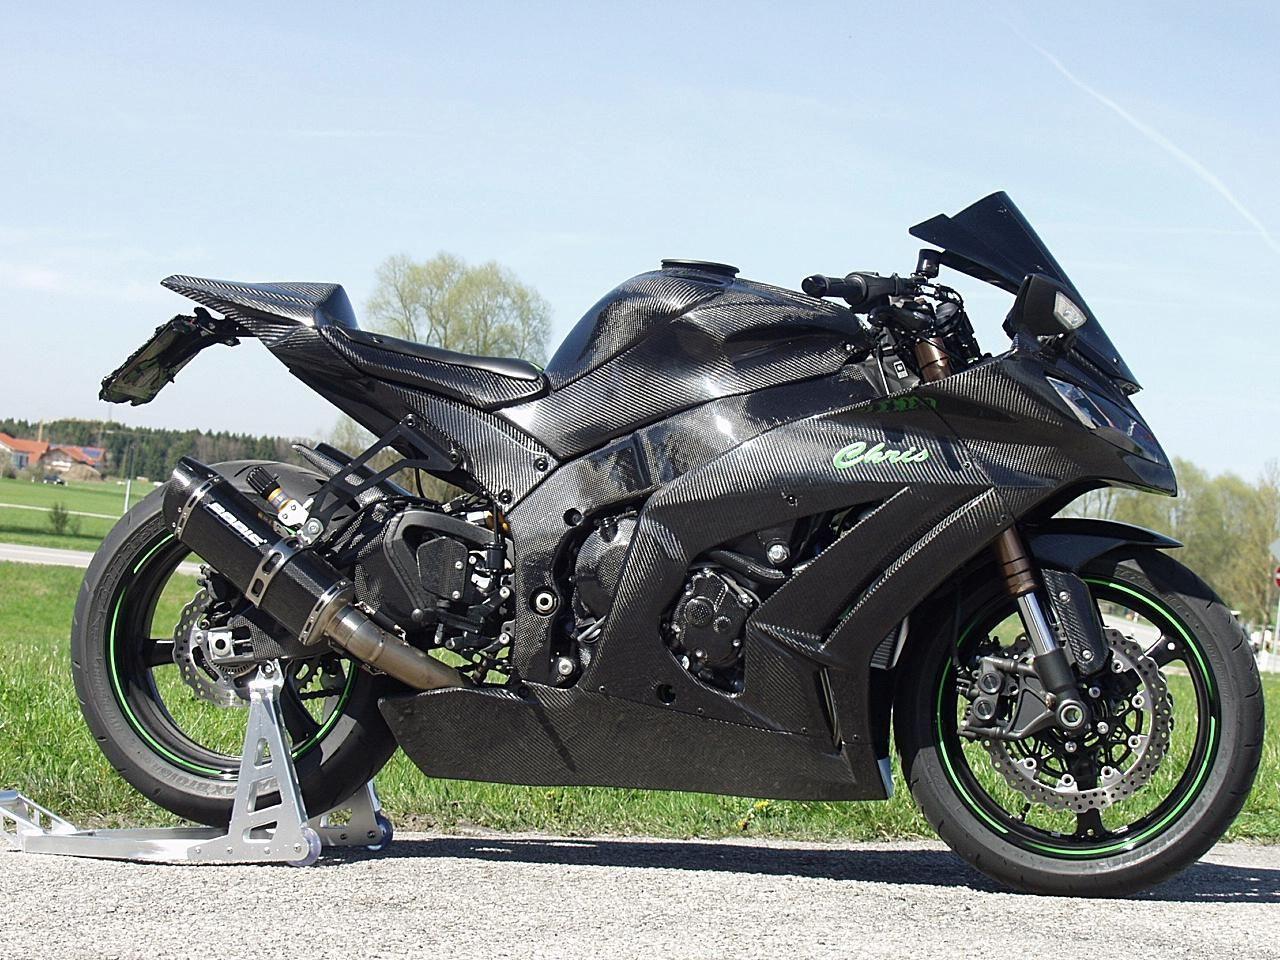 Kawasaki Ninja ZX10R Carbon